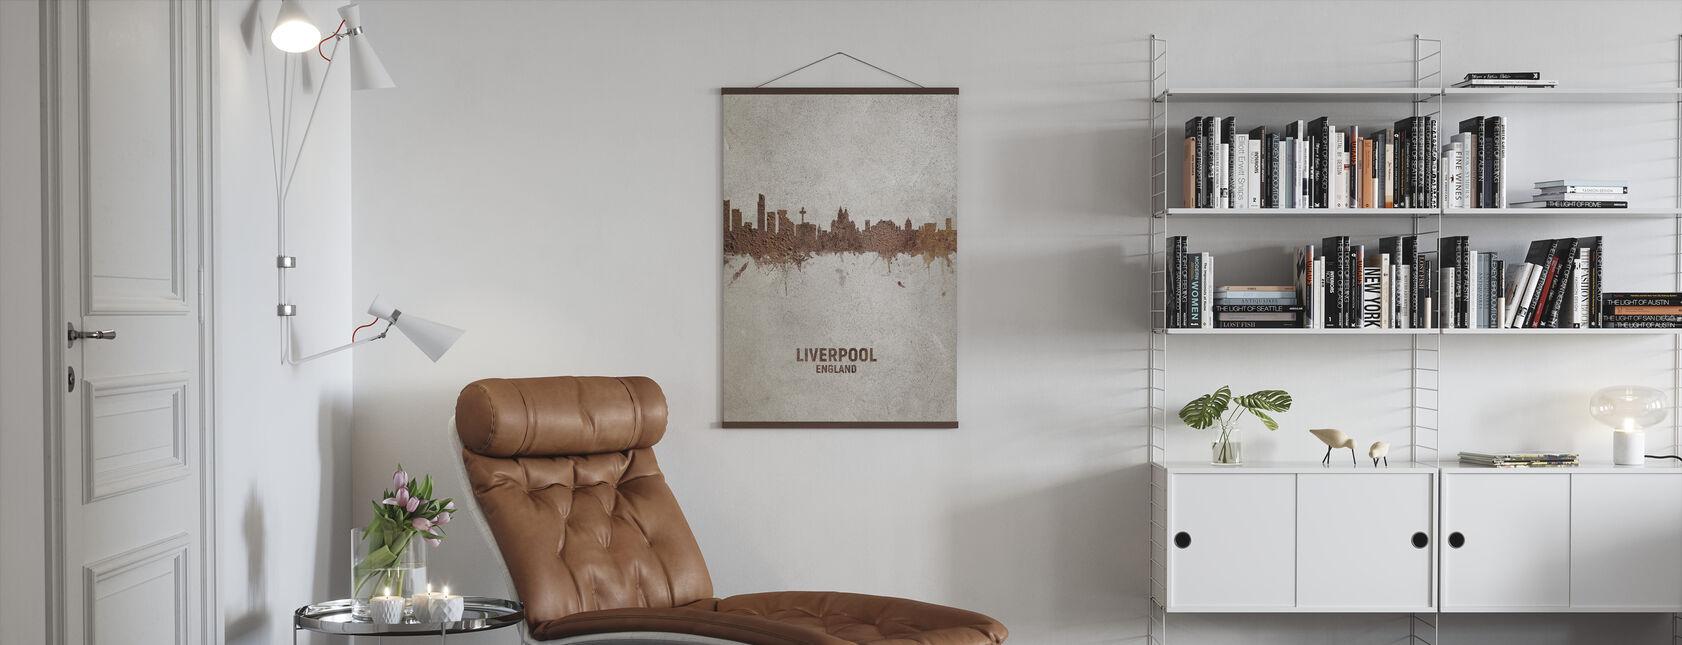 Liverpool England Rust Skyline - Poster - Living Room